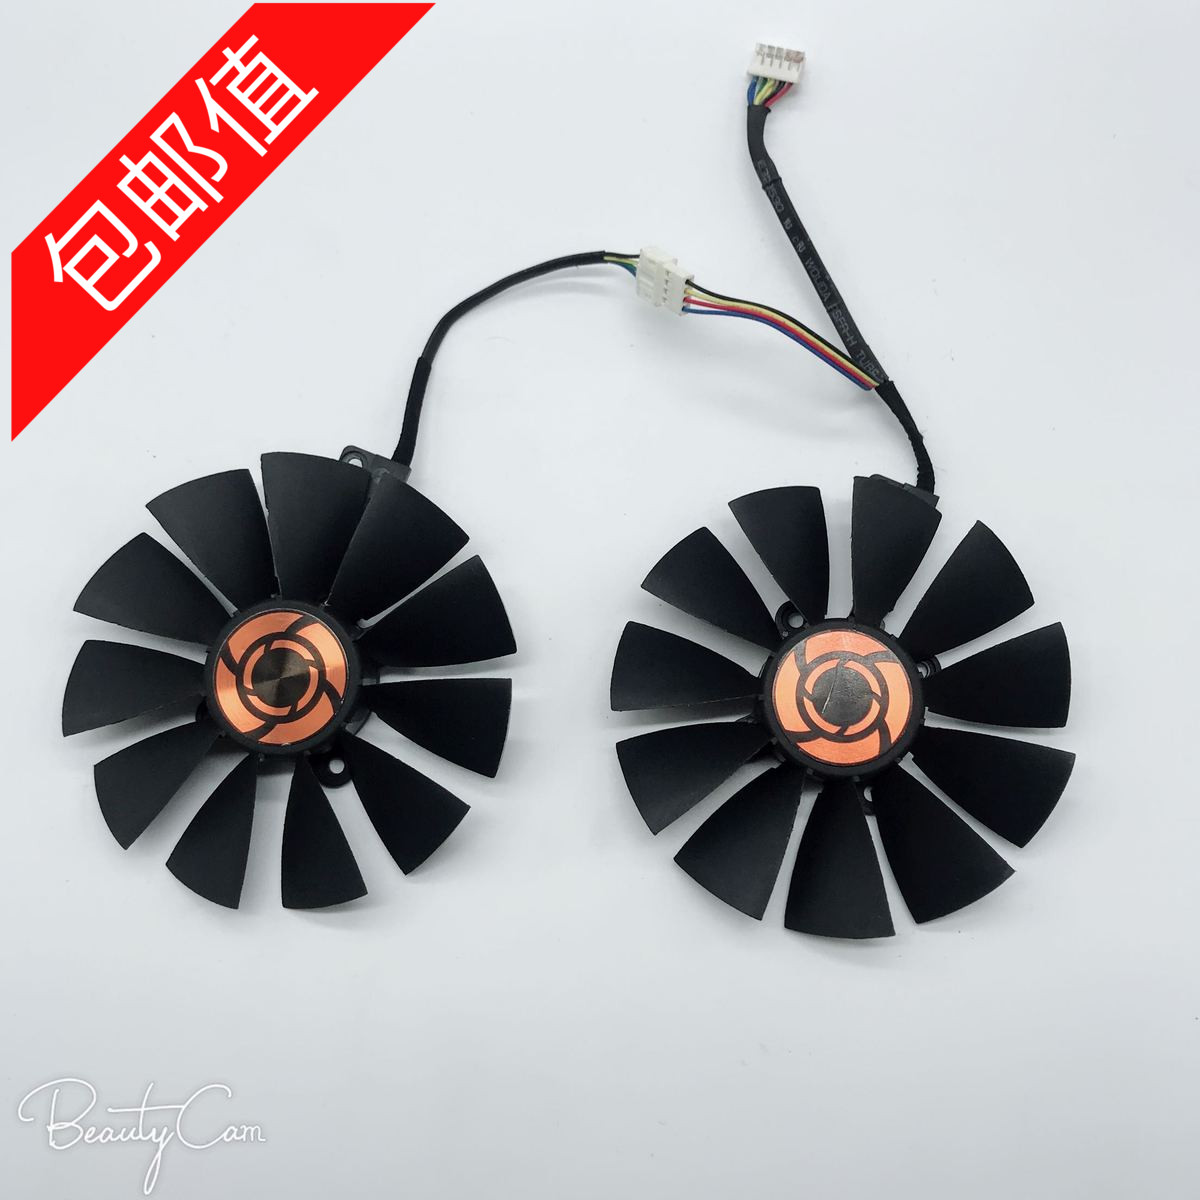 ASUS華碩GTX970 980 980Ti 780 780Ti R9 285顯卡風扇FD9015U12S